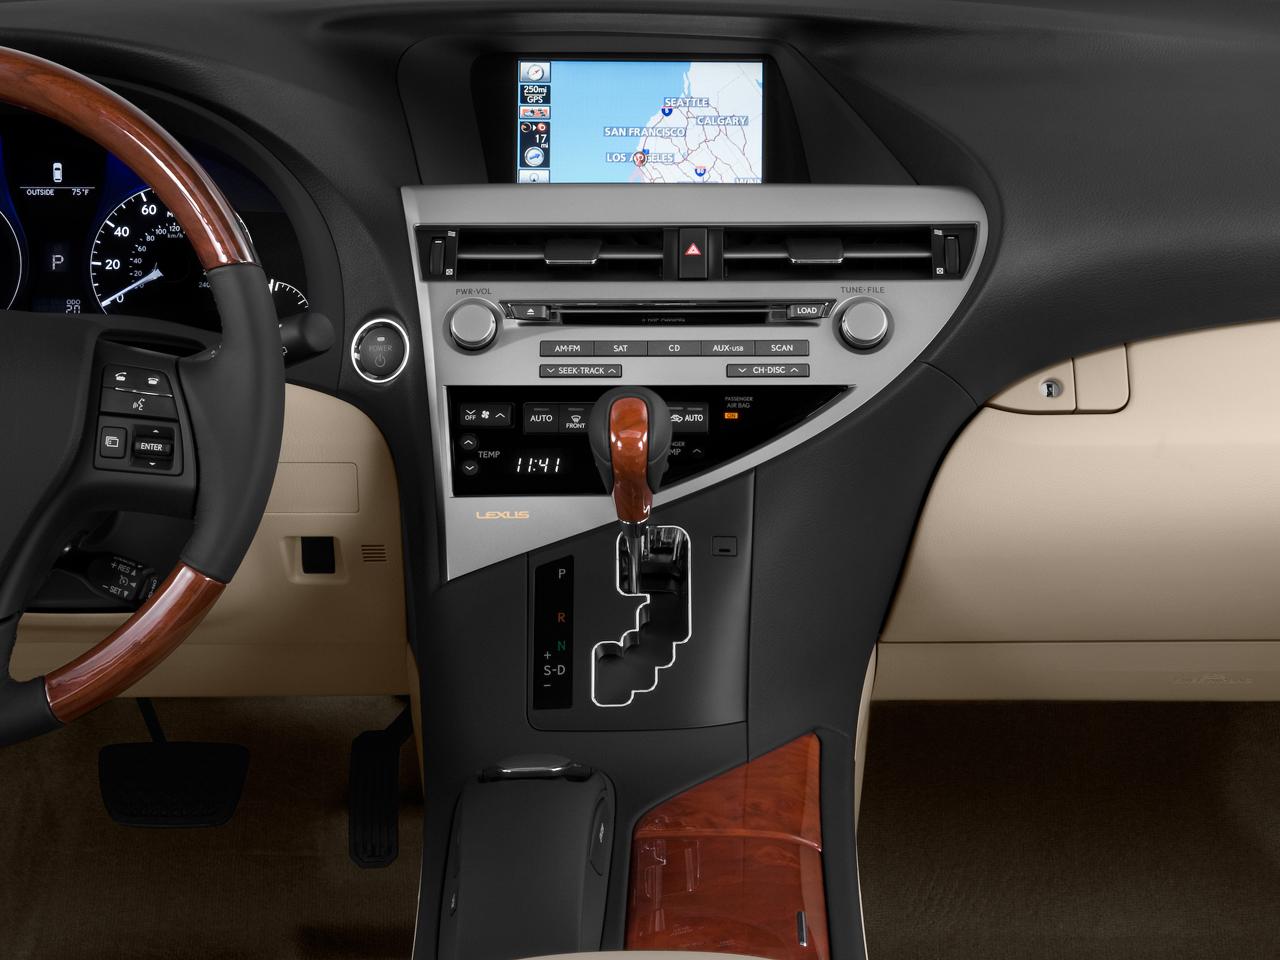 2010 Lexus RX350 - Lexus Luxury Crossover SUV Review ...